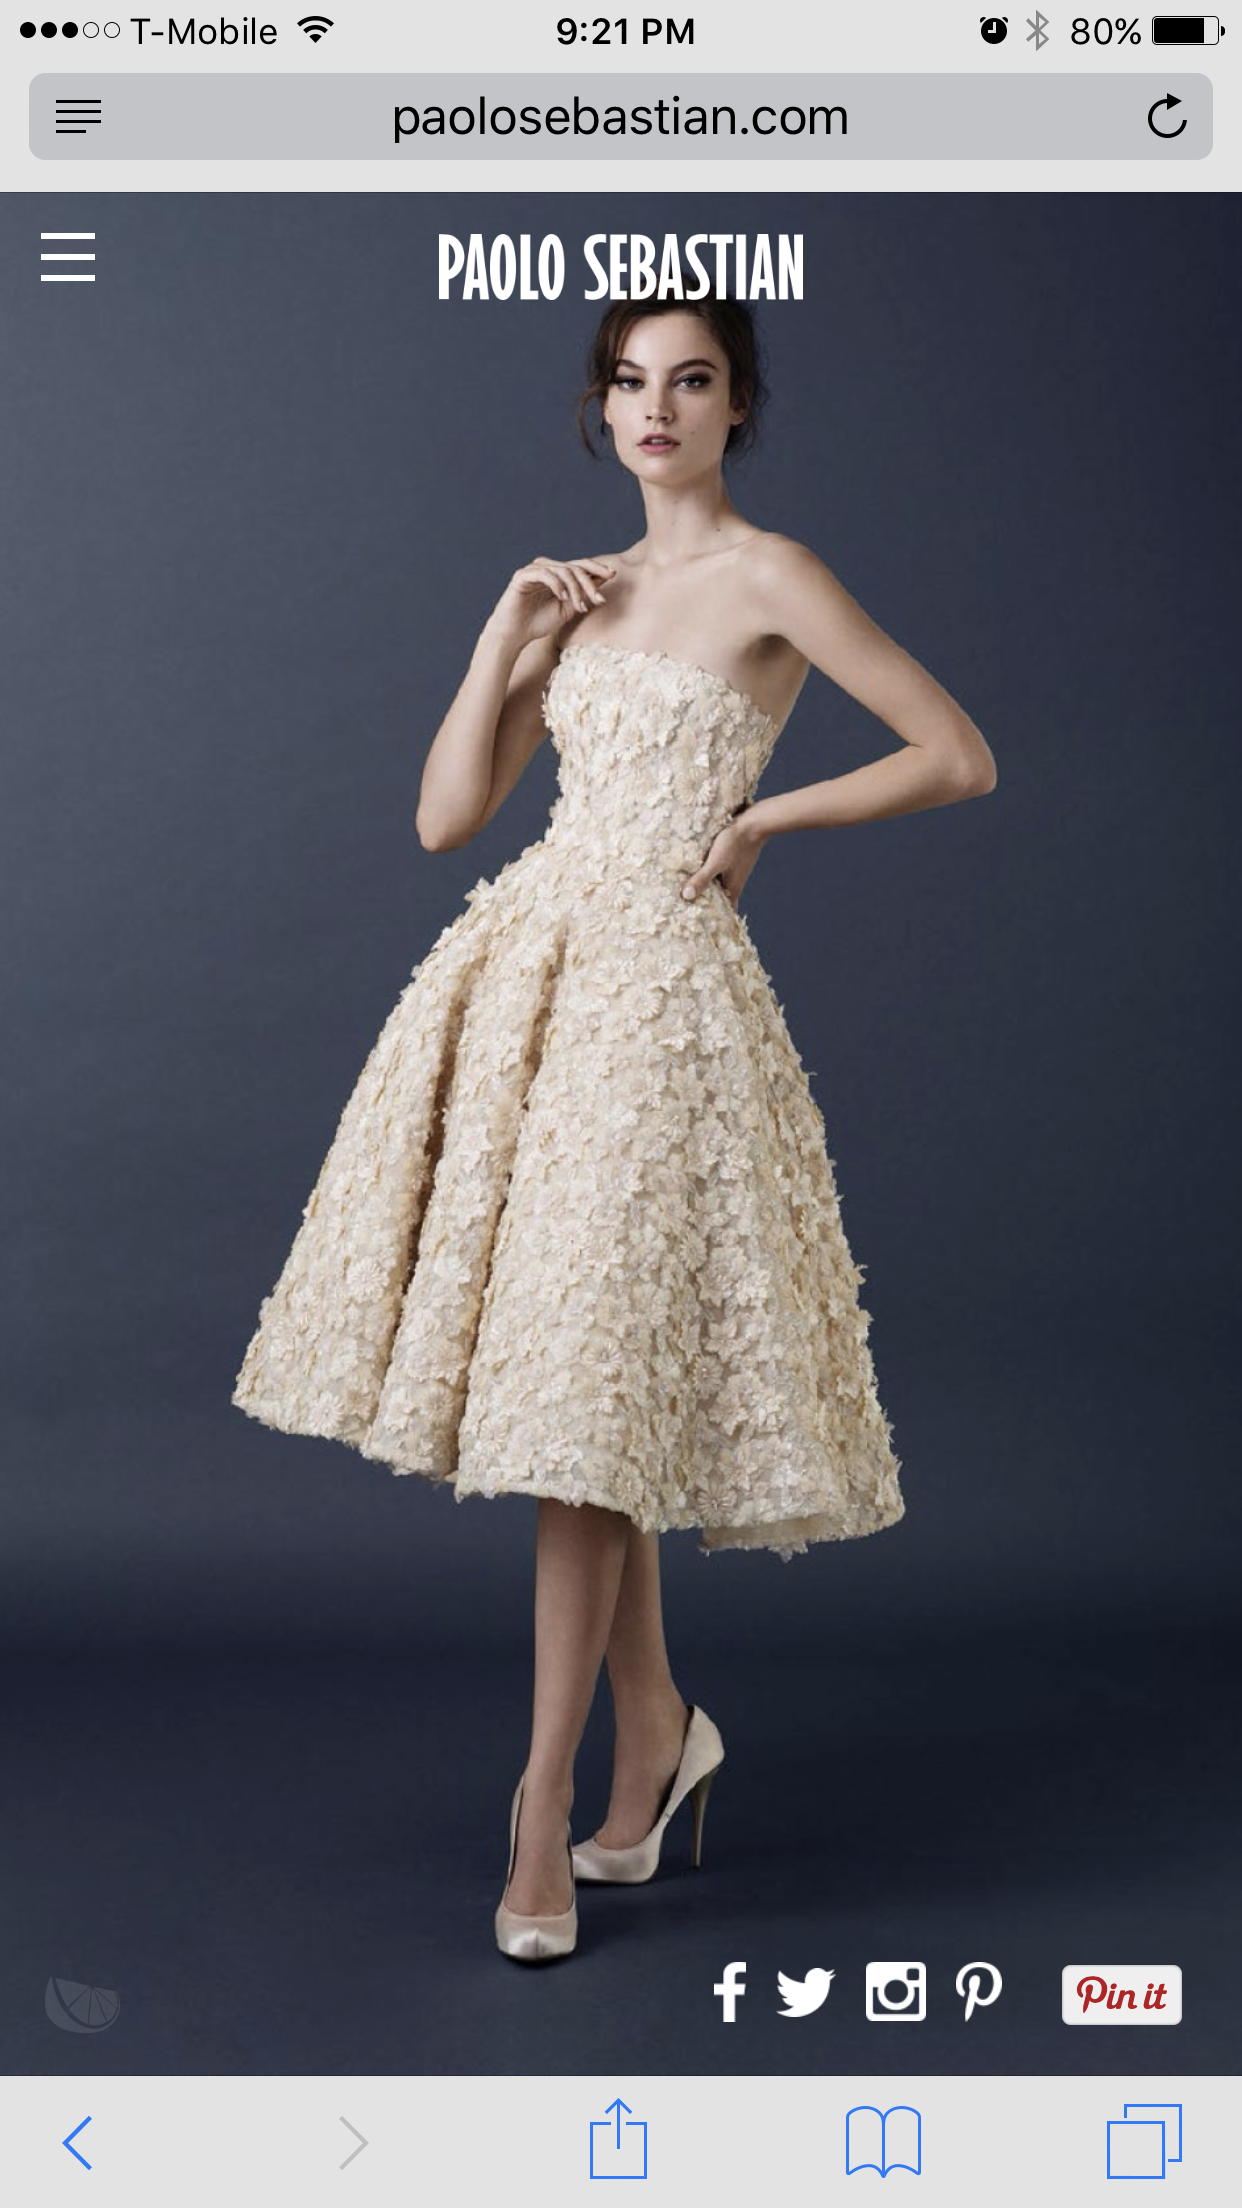 Pin by bella carrillo on paolo sebastian dresses pinterest paolo